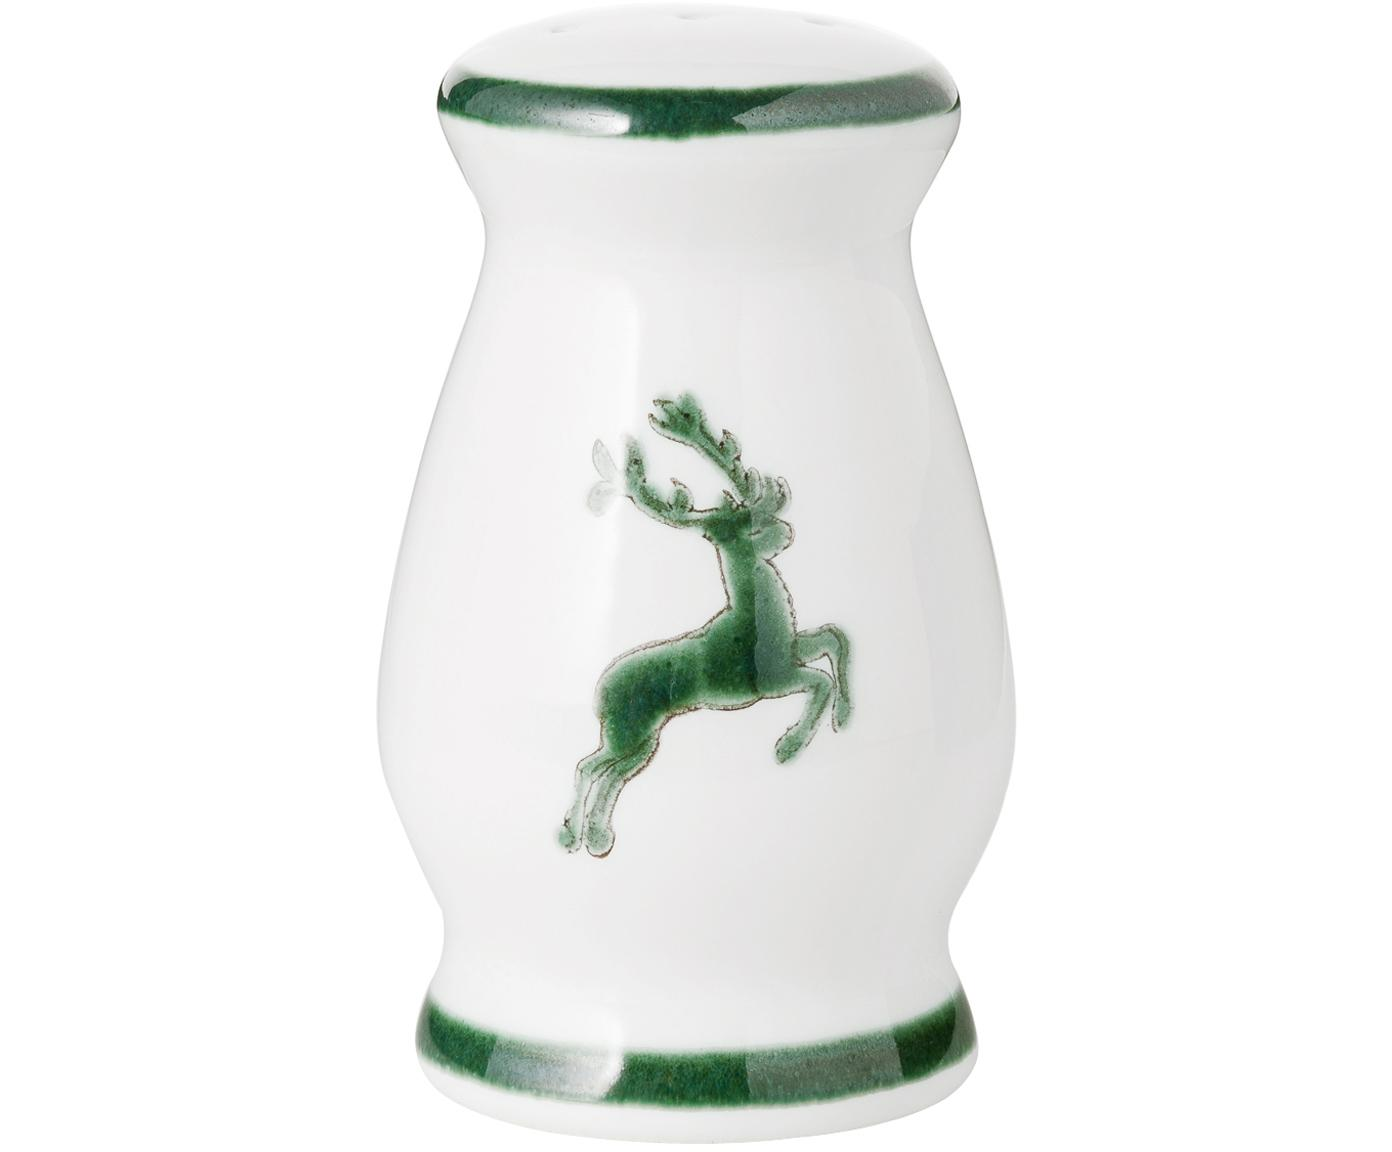 Peperstrooier Gourmet Groene Hert, Keramiek, Groen, wit, 4 x 6 cm